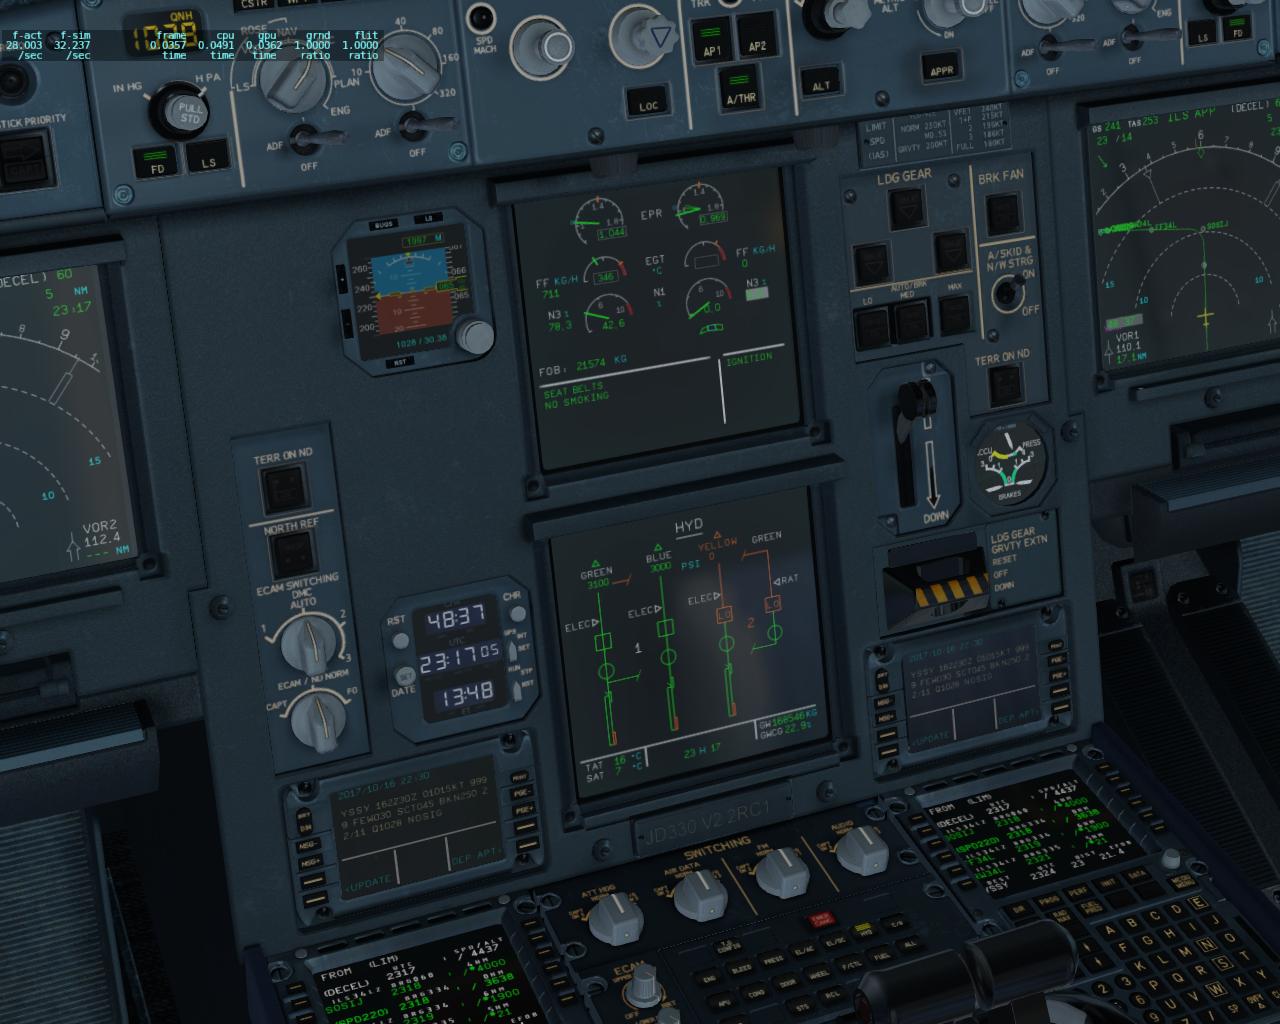 JD330 Airliner ver 2 2 RC1, R2, R3 WIN/MAC 64 bit (X-Plane